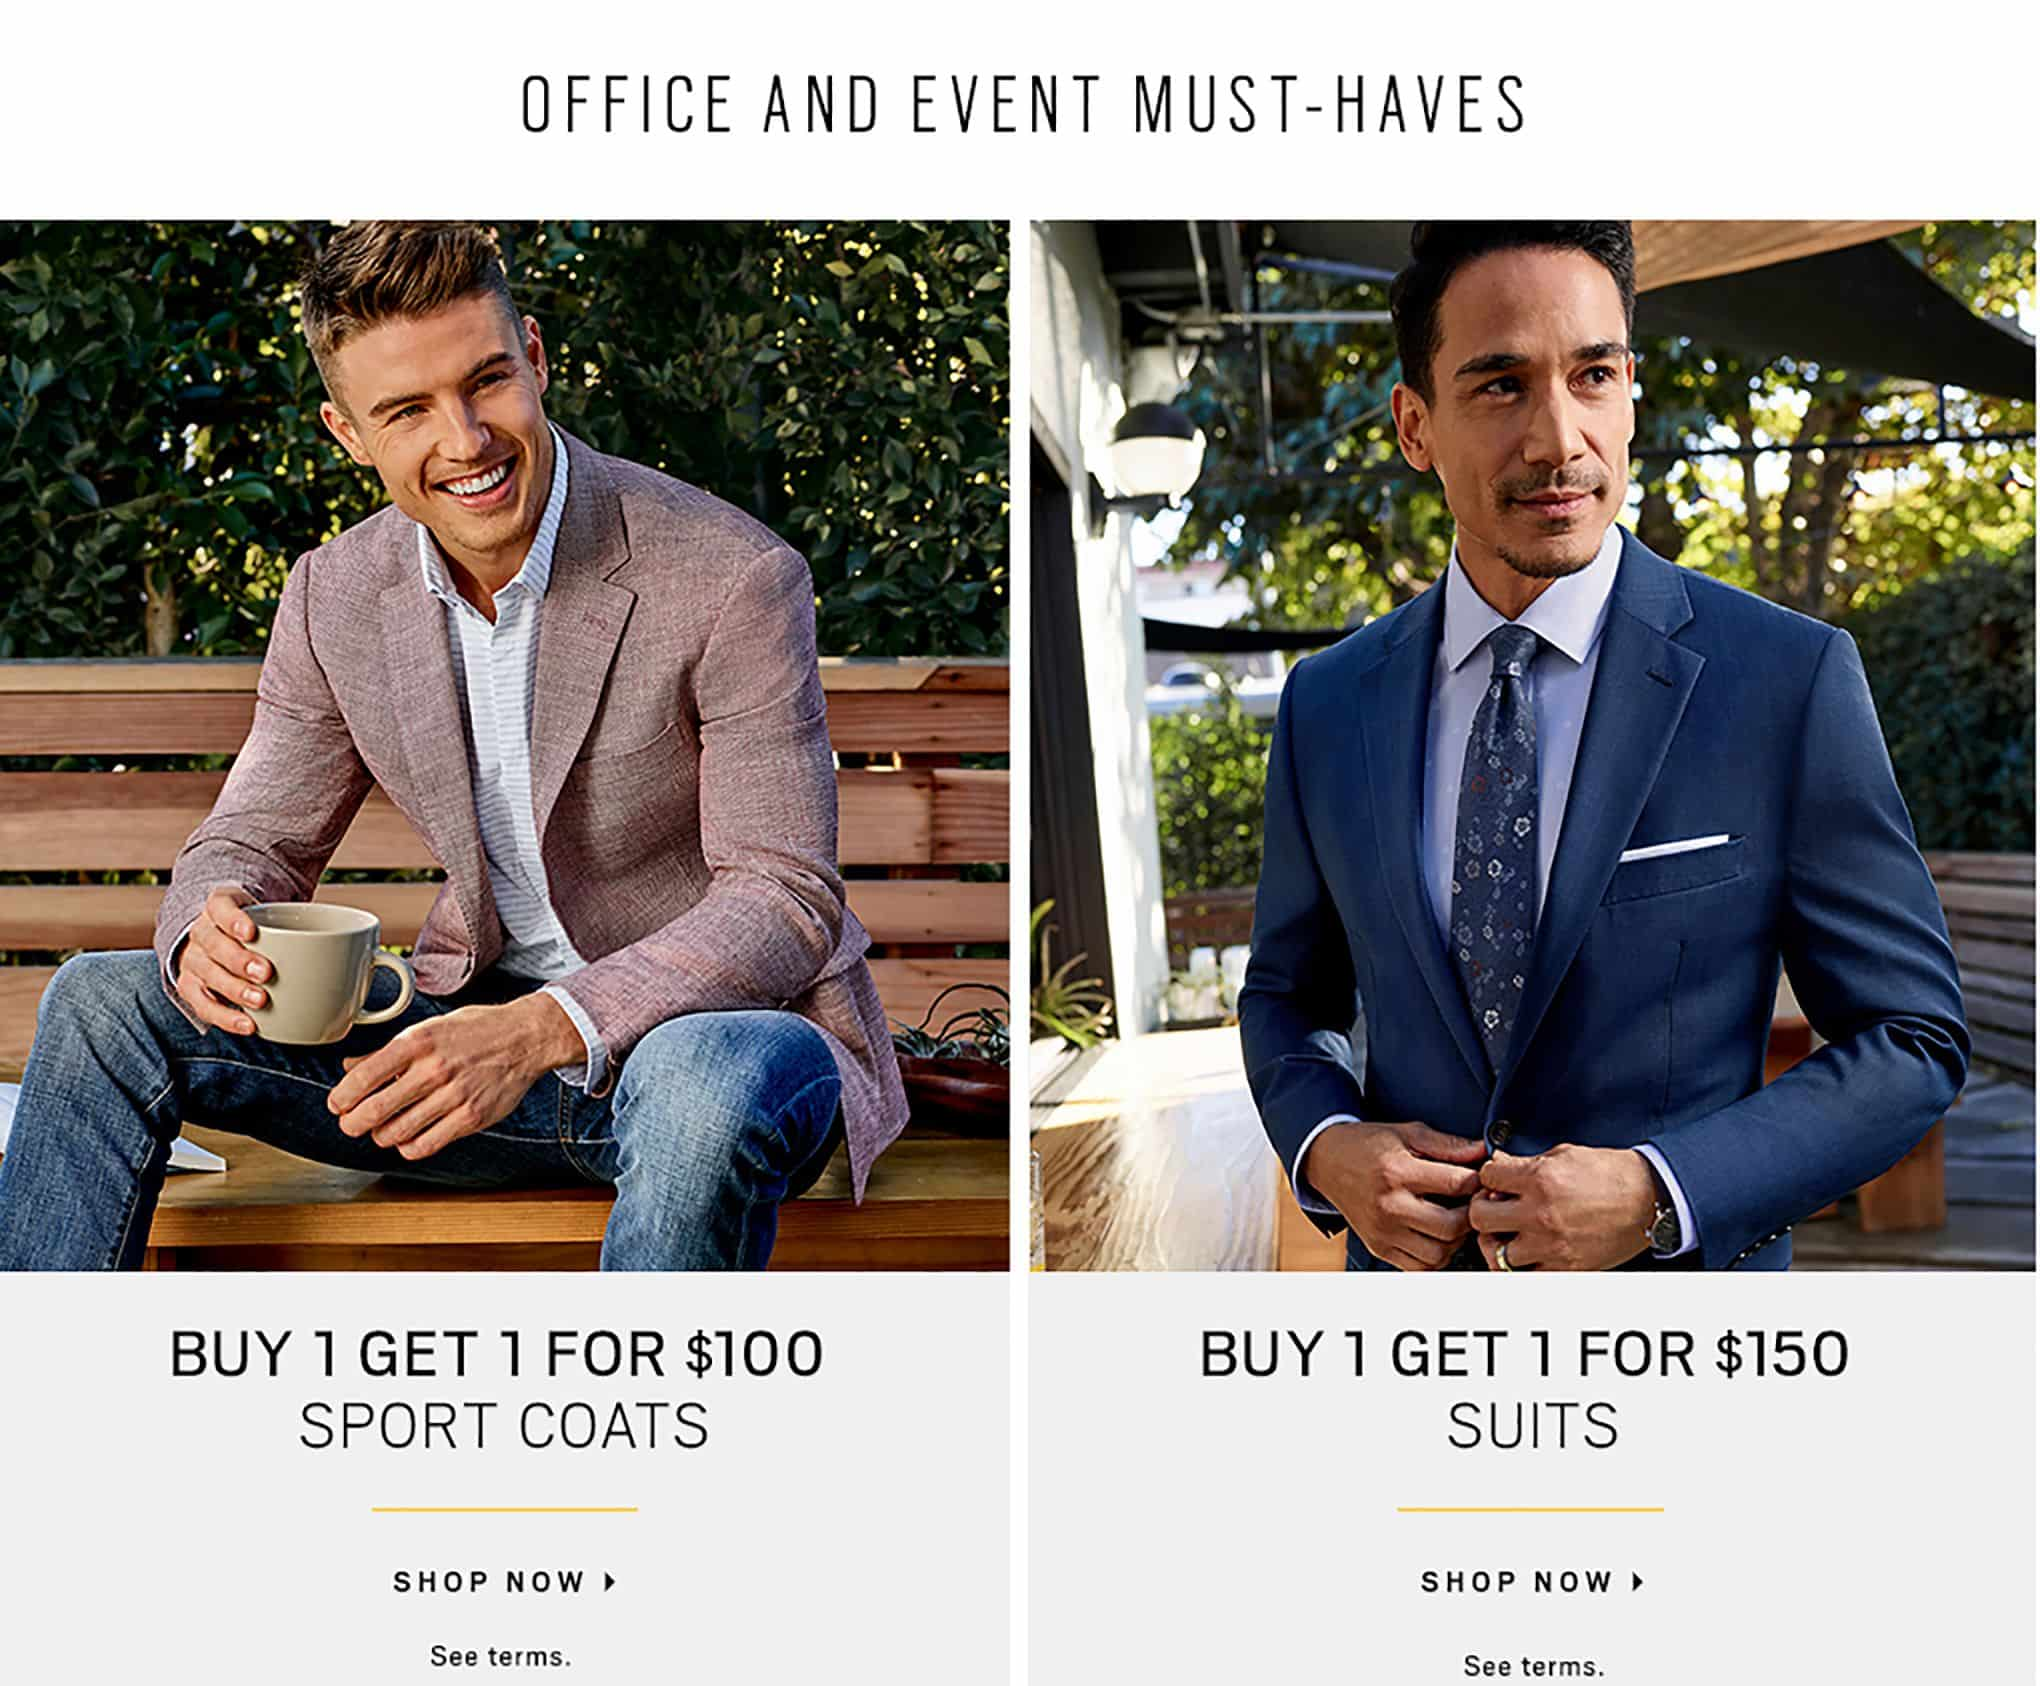 11dffc50a5 Shop Men's Clothing - Mens Suits, Dress Shirts & Sportcoats | Men's ...